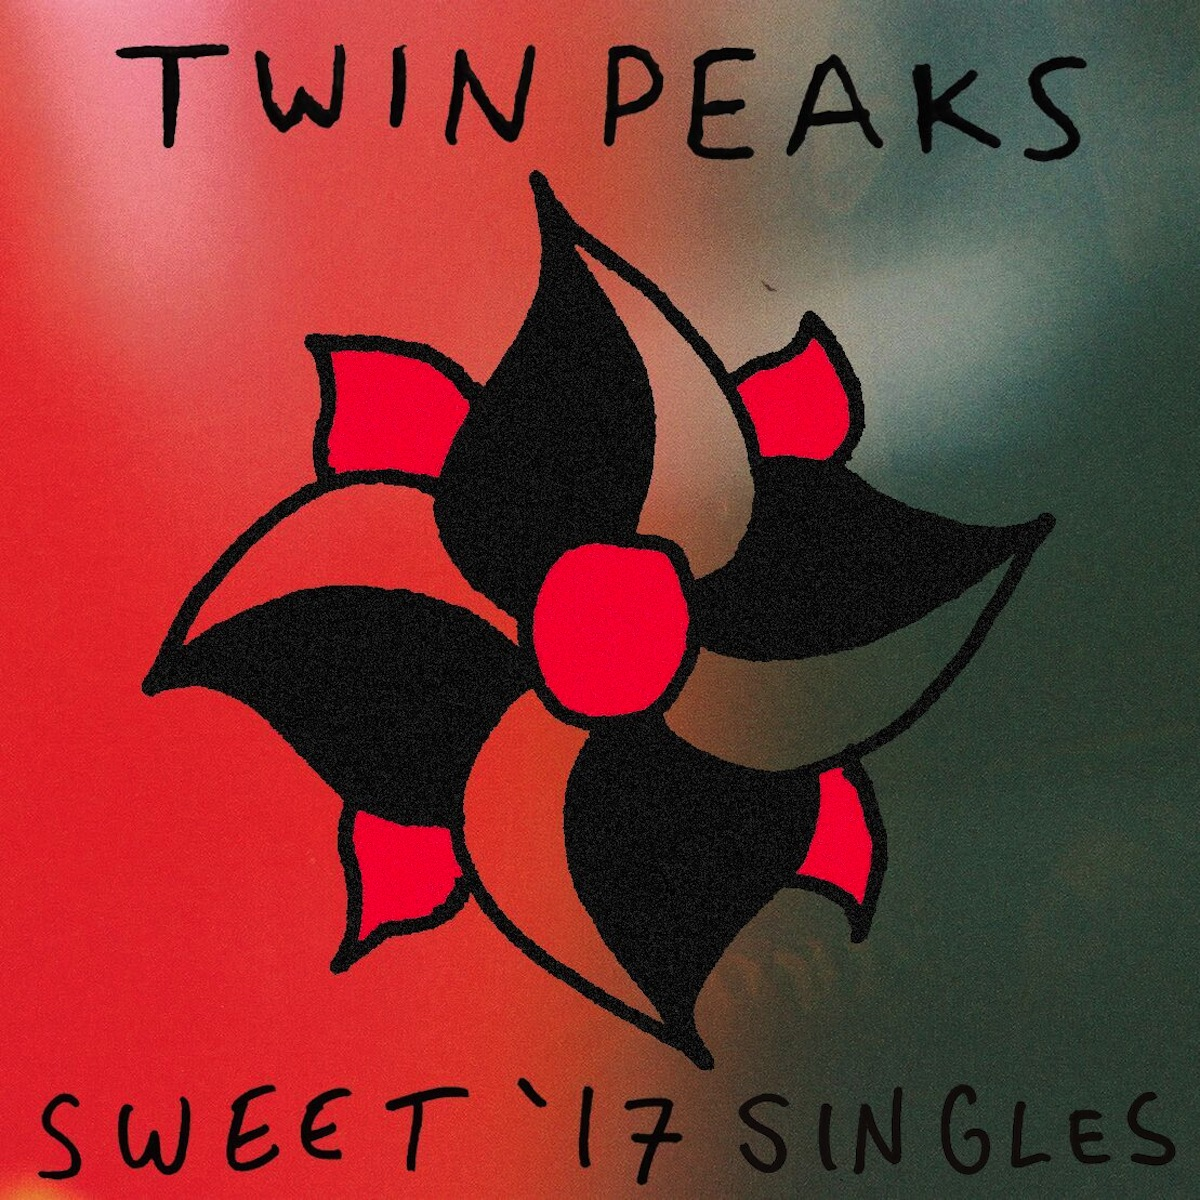 meet twin peaks singles Sf bay area groups - craigslist cl  favorite this post jul 17 singles group (san rafael)  (twin peaks / diamond hts).